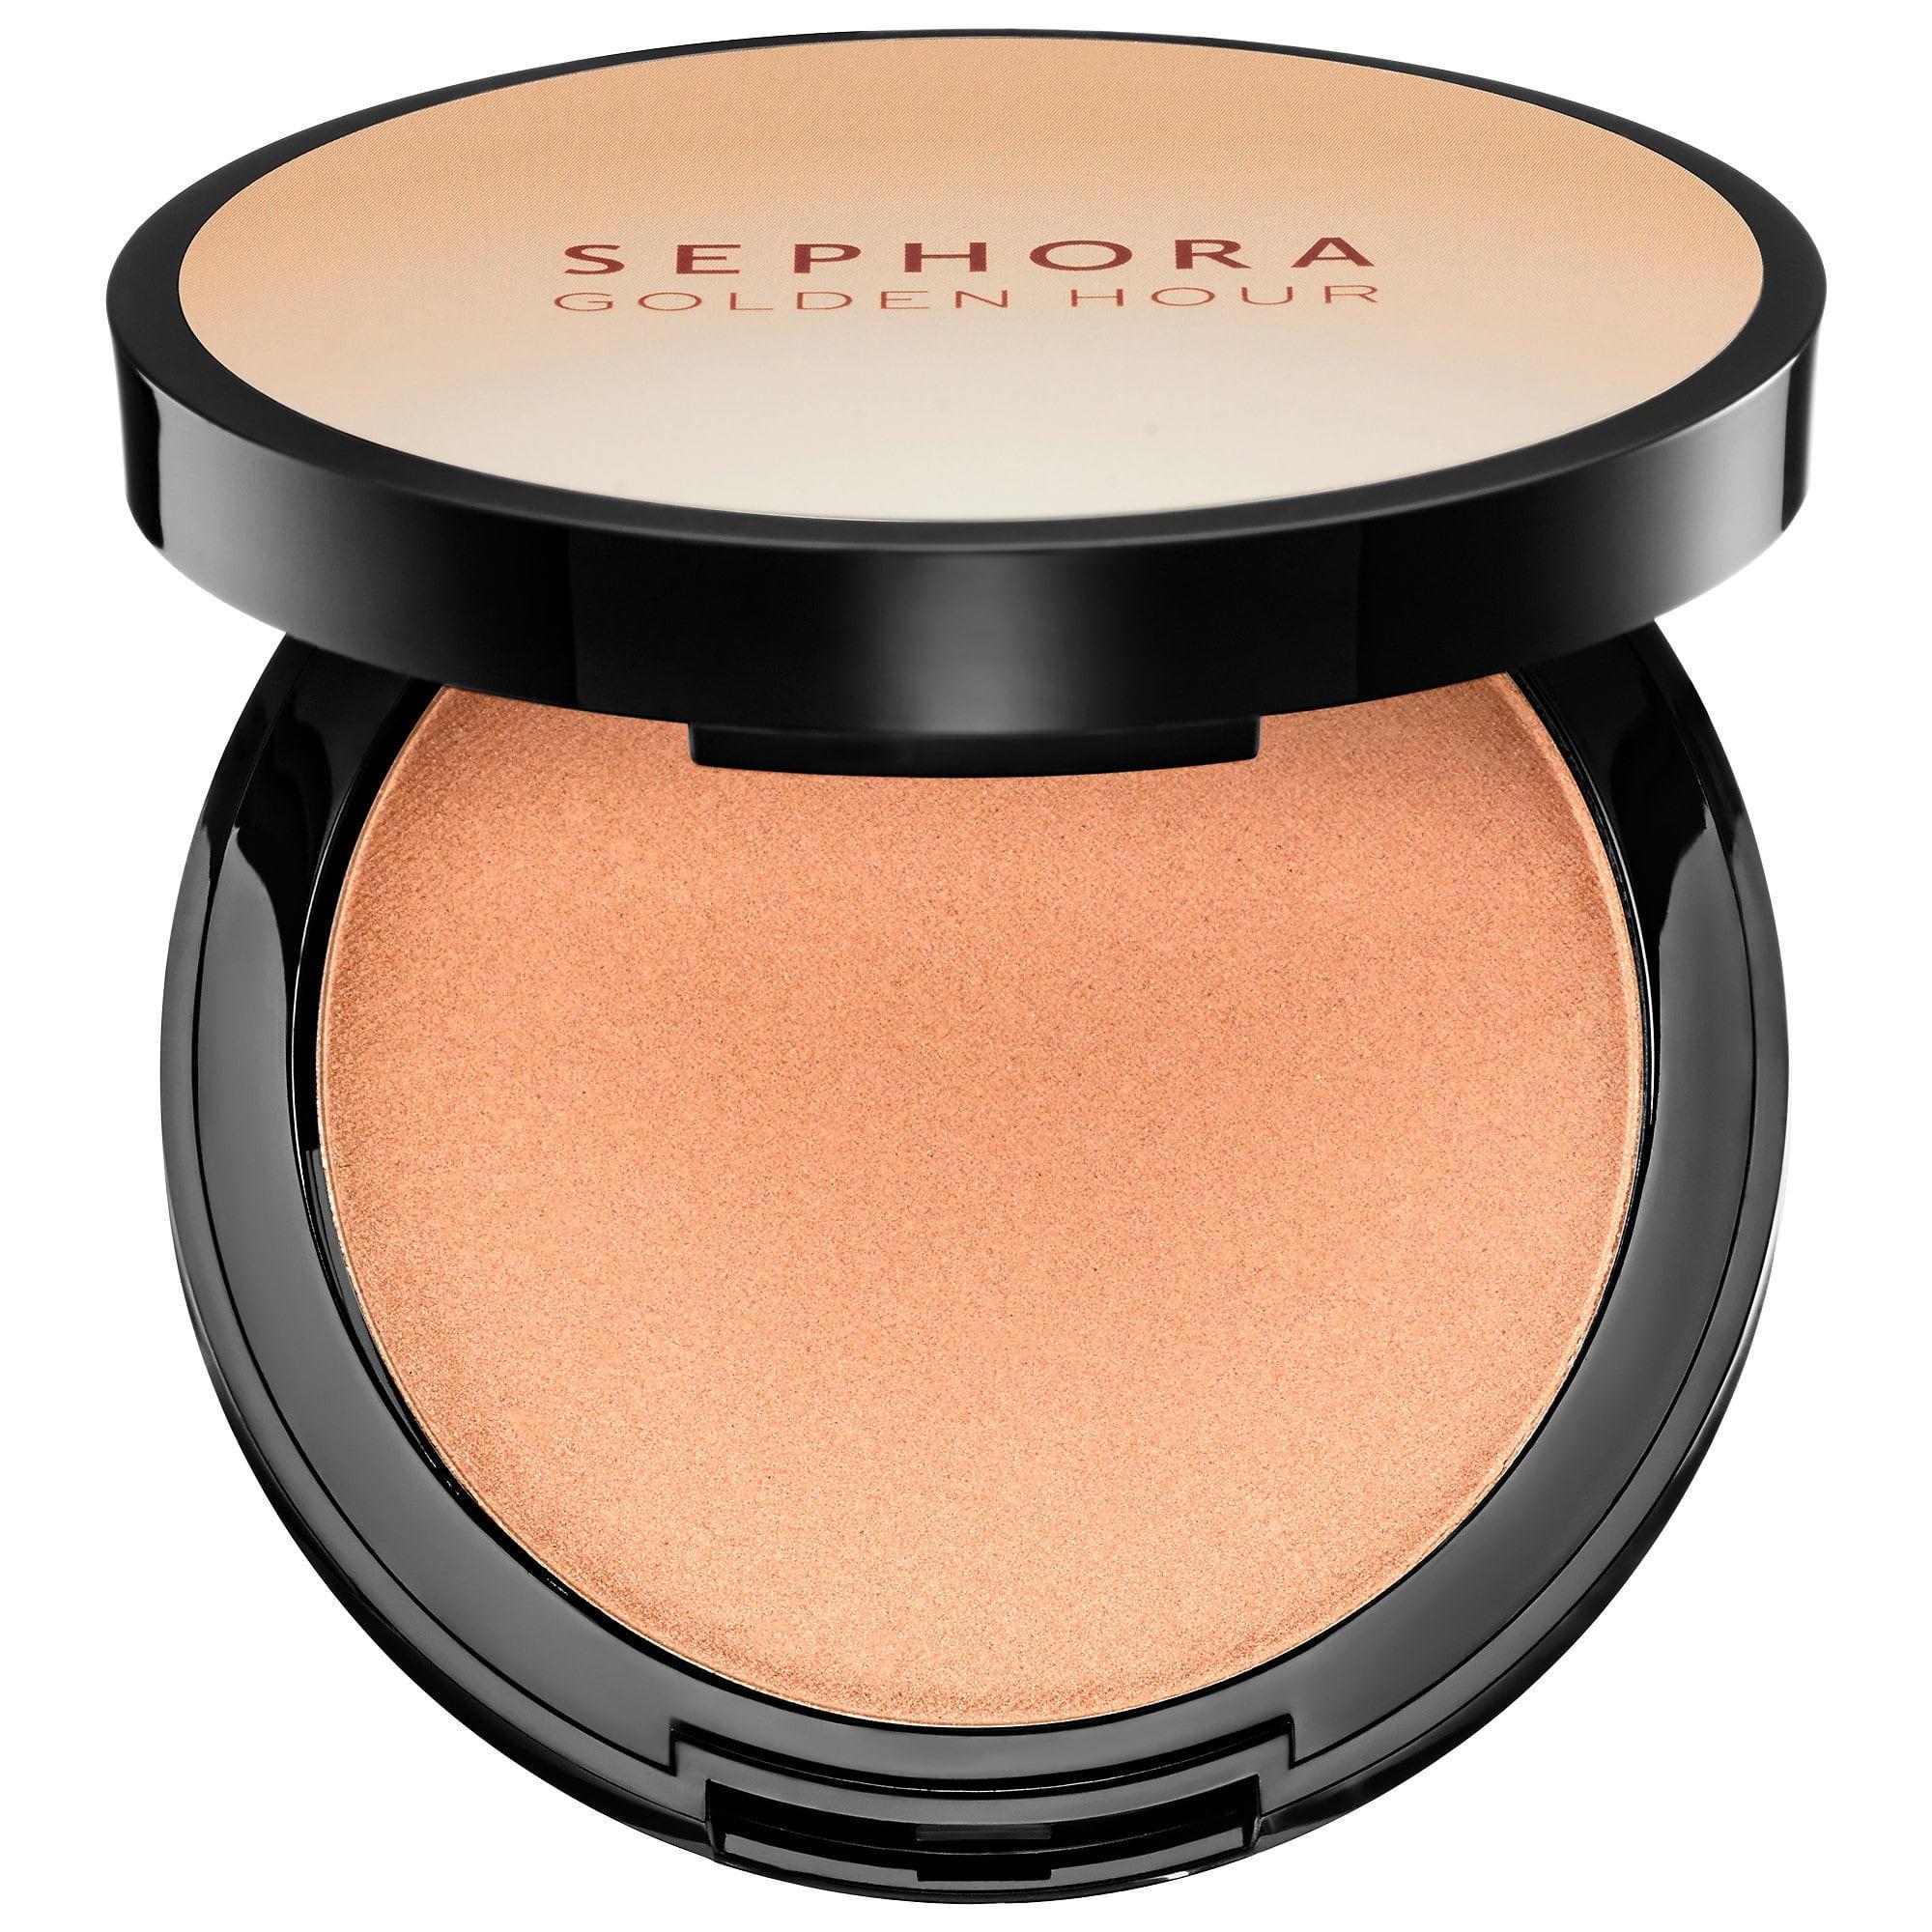 Sephora Golden Hour Luminizing Powder Dawn 02